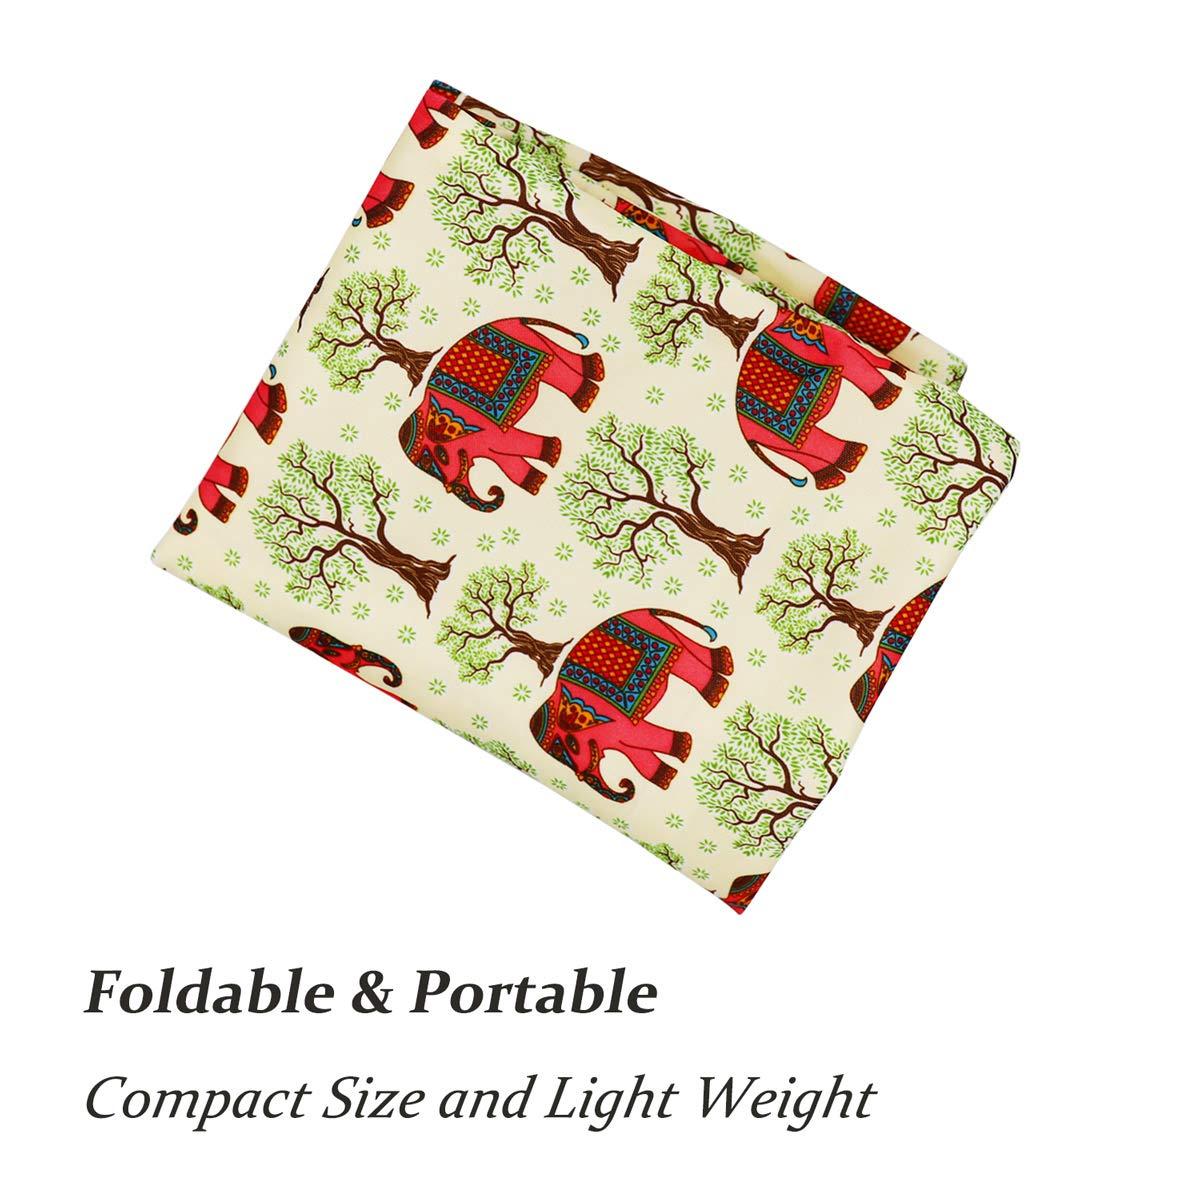 Piscina 3 PCS Impermeable Reutilizable Lavable Bolsa Organizador de Maquillaje Gym con 2 Cremallera para Mam/á y Beb/é Playa Bolsa de Pa/ñales Viajes ViVidLife Wetbag